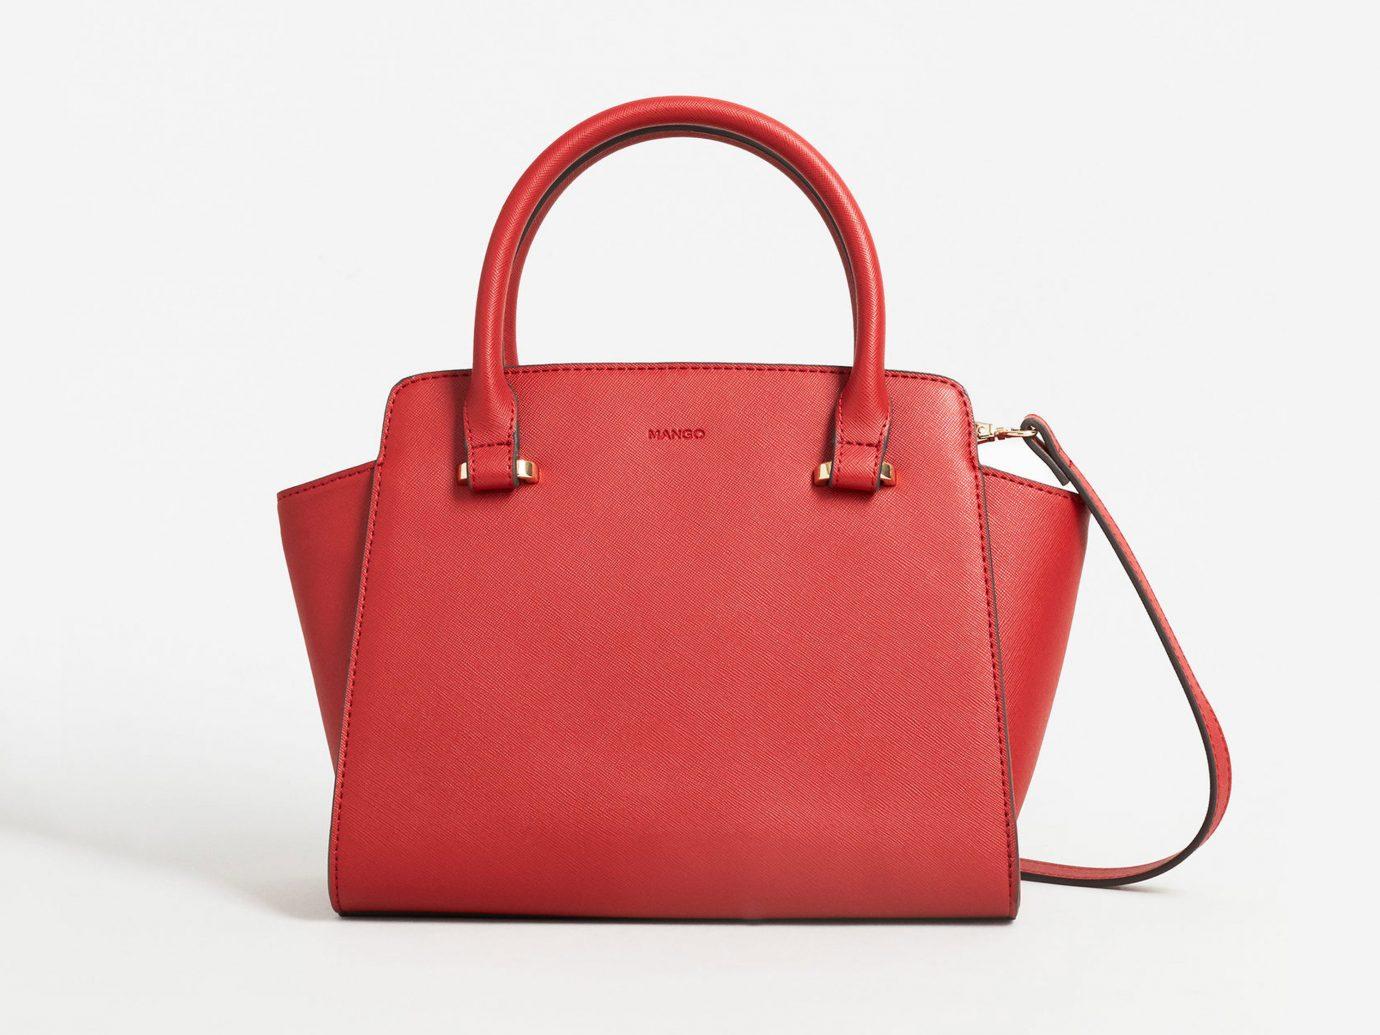 Style + Design handbag bag accessory shoulder bag case fashion accessory leather tote bag brand